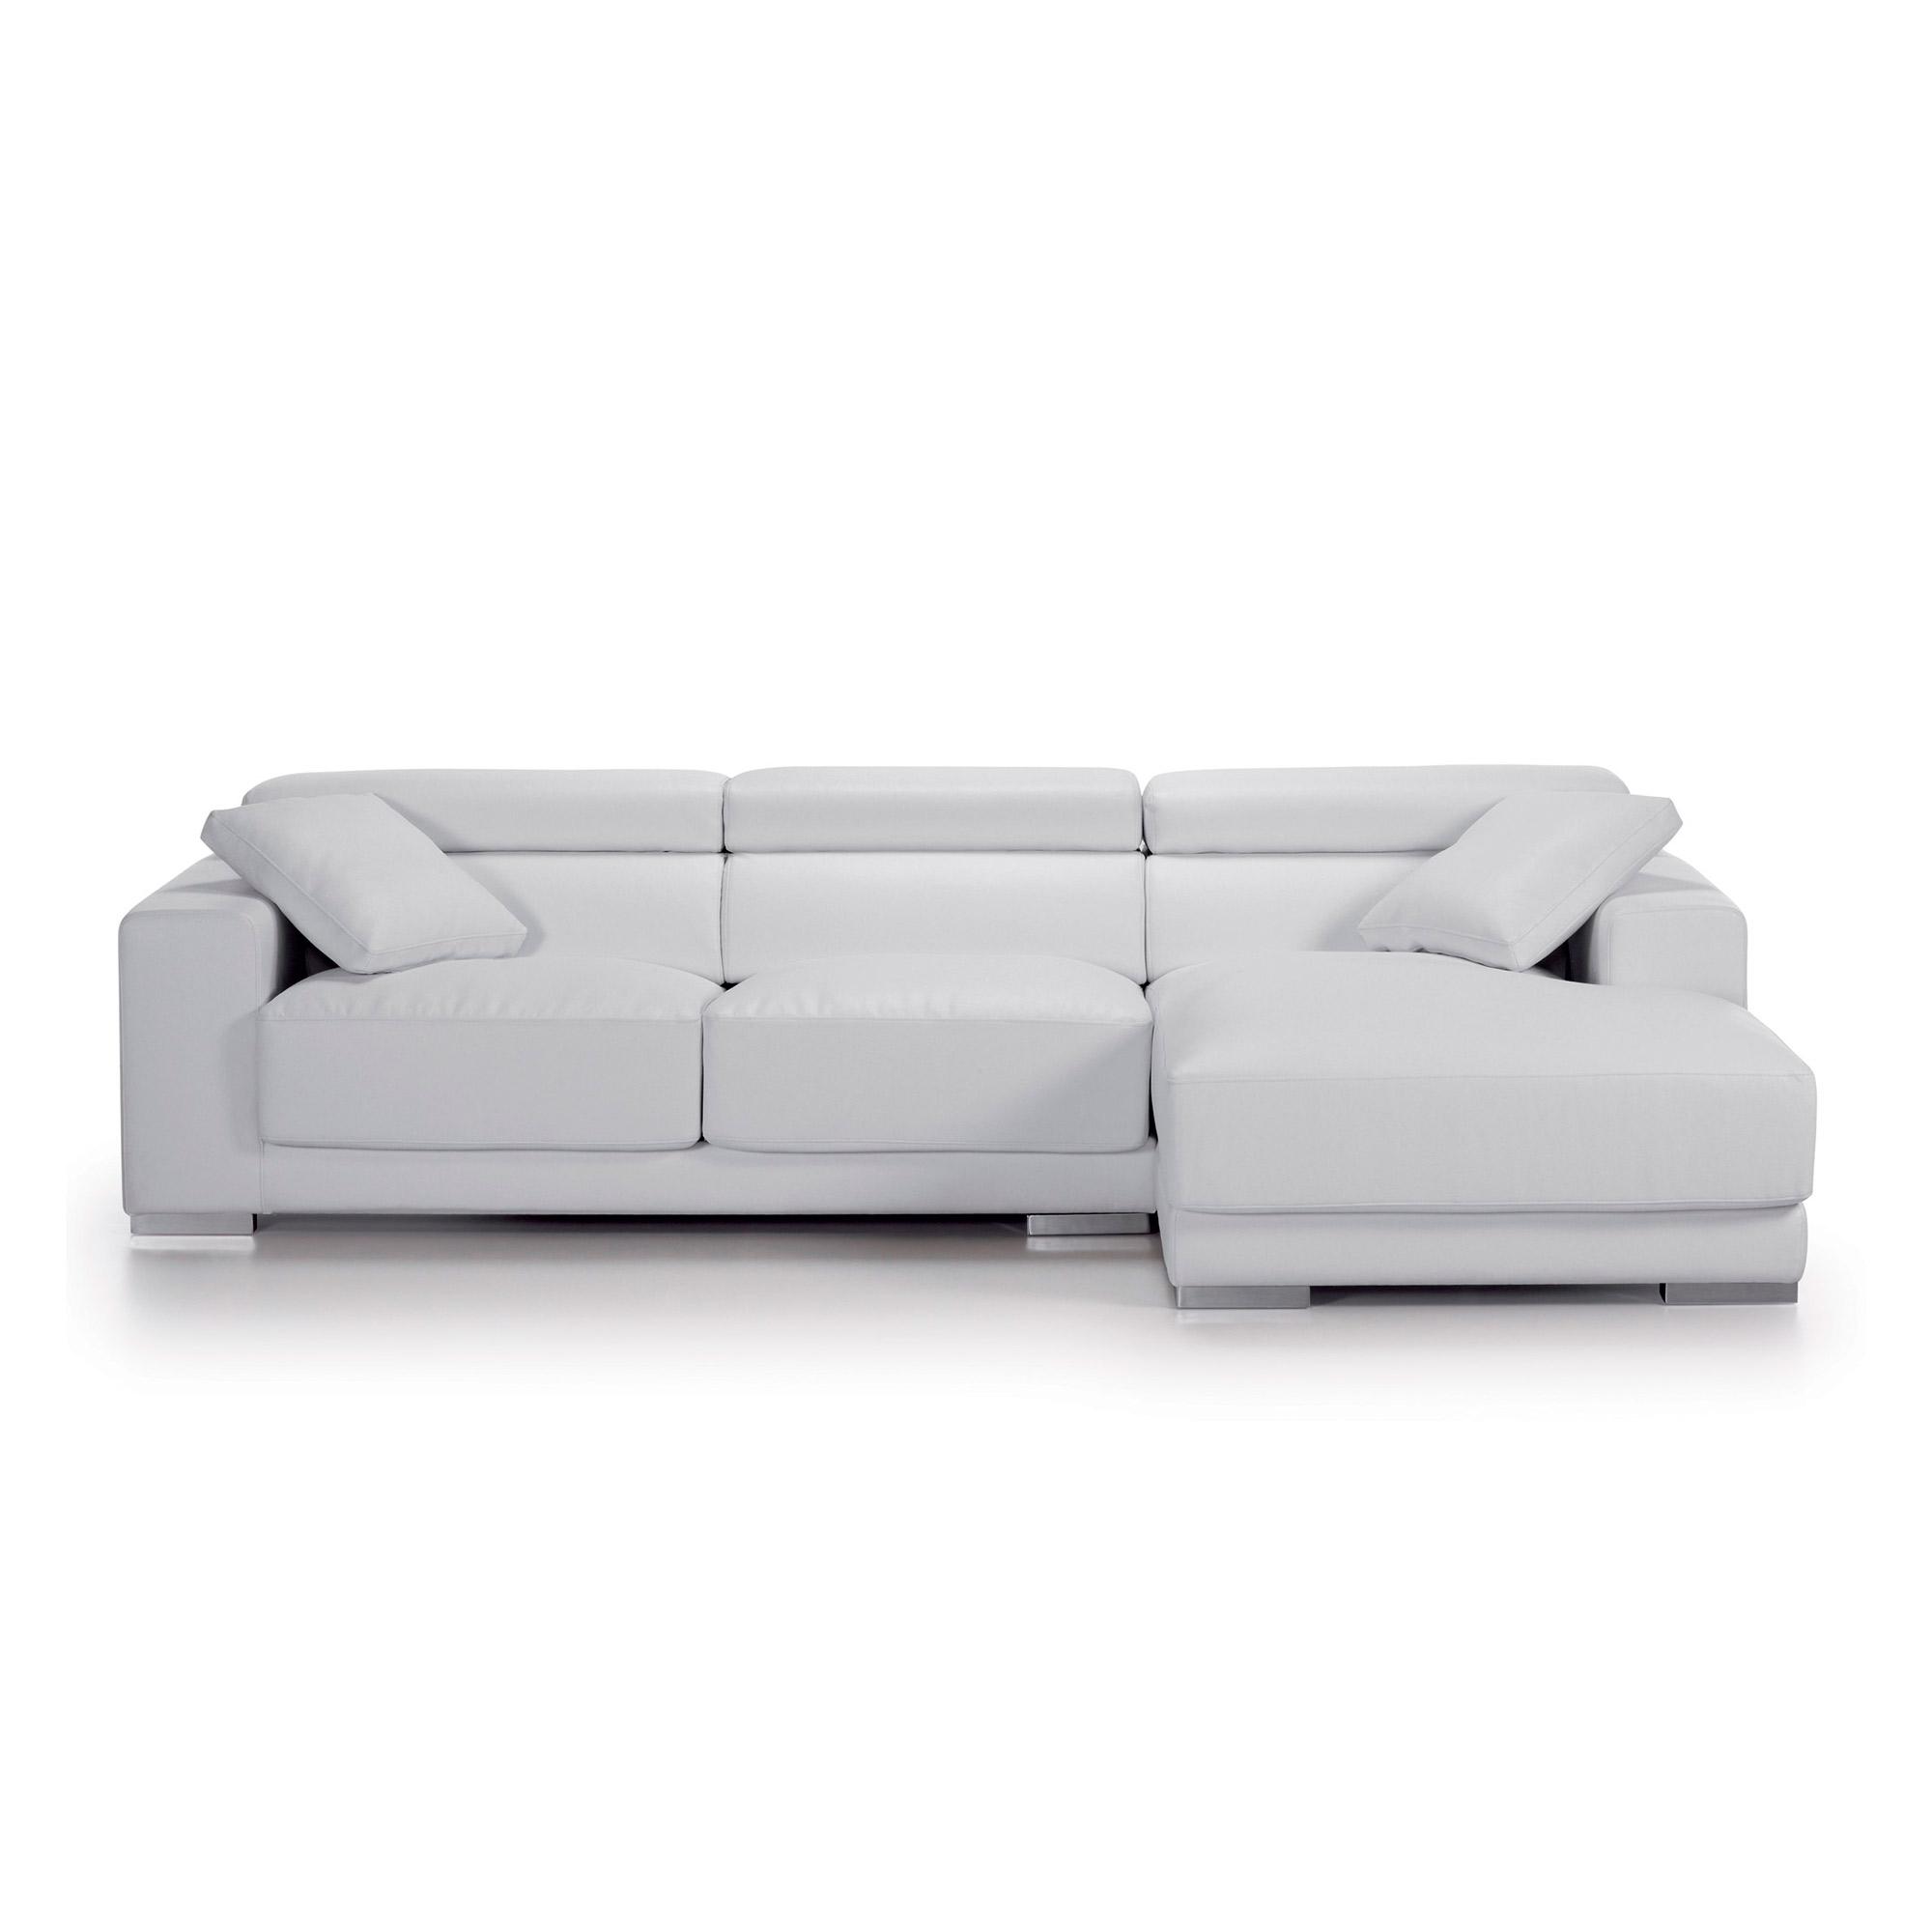 singapore sofa 3p ch der recl desliz eco piel b puro. Black Bedroom Furniture Sets. Home Design Ideas